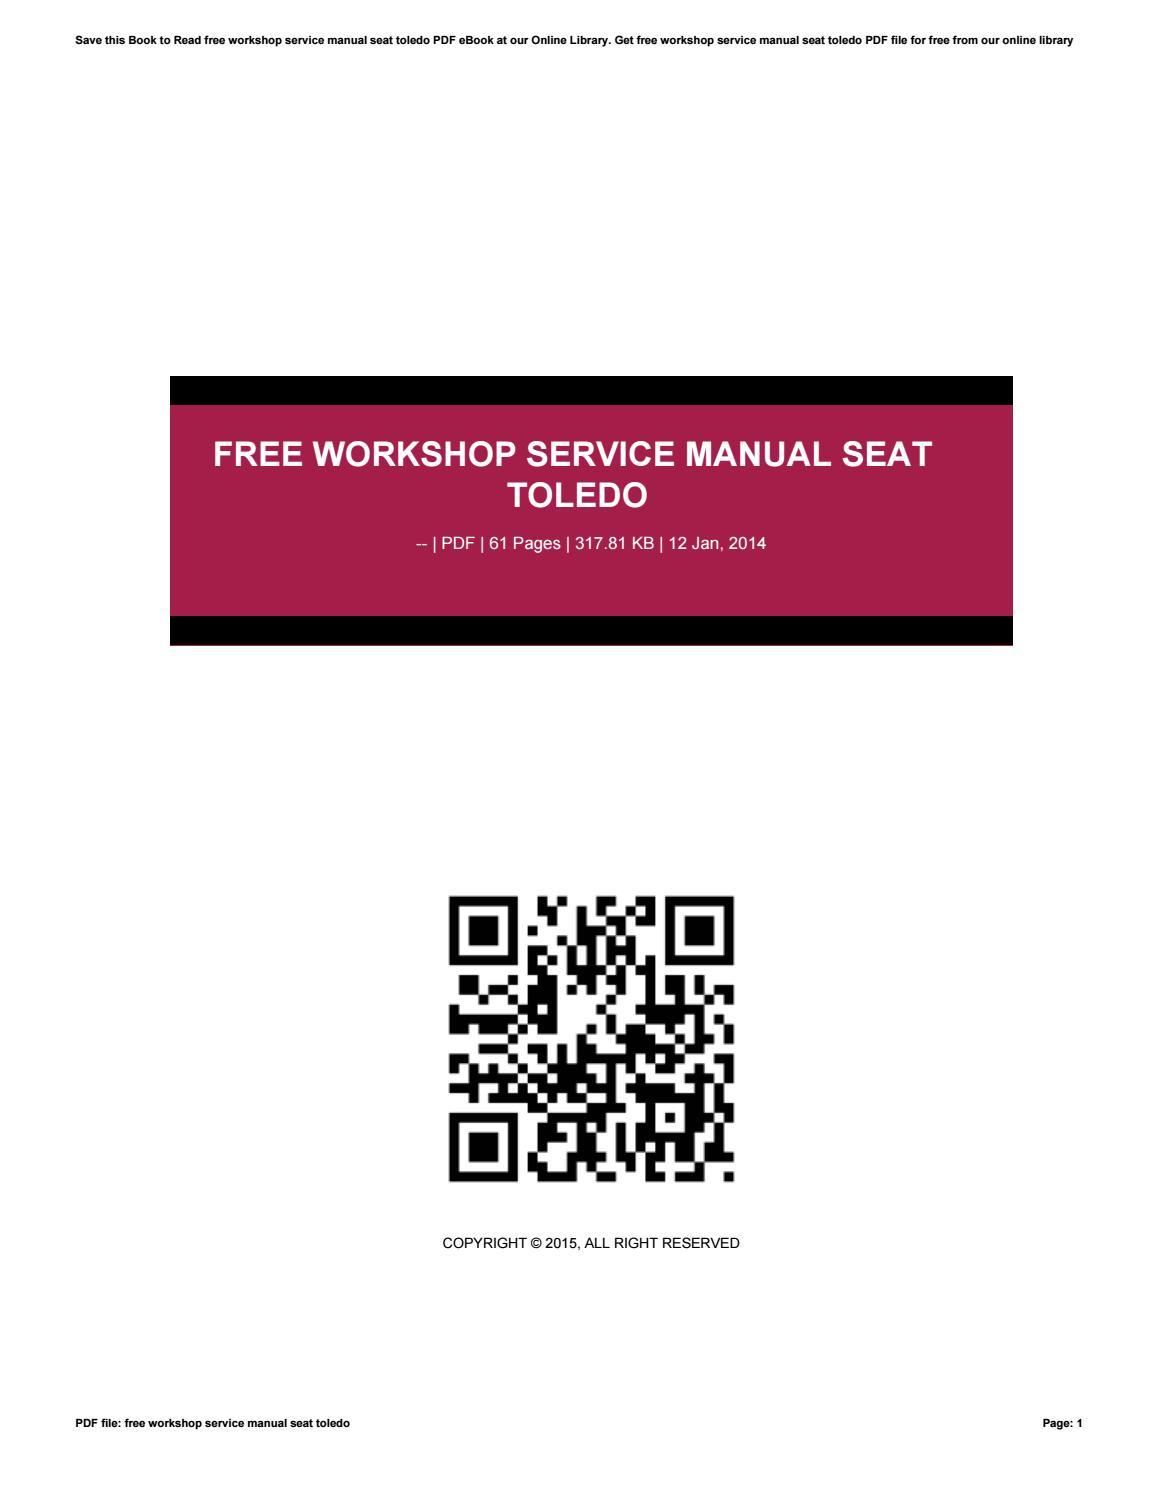 free workshop service manual seat toledo by kanthi155dista issuu rh issuu com mettler toledo ind780 service manual lynx mettler toledo service manual